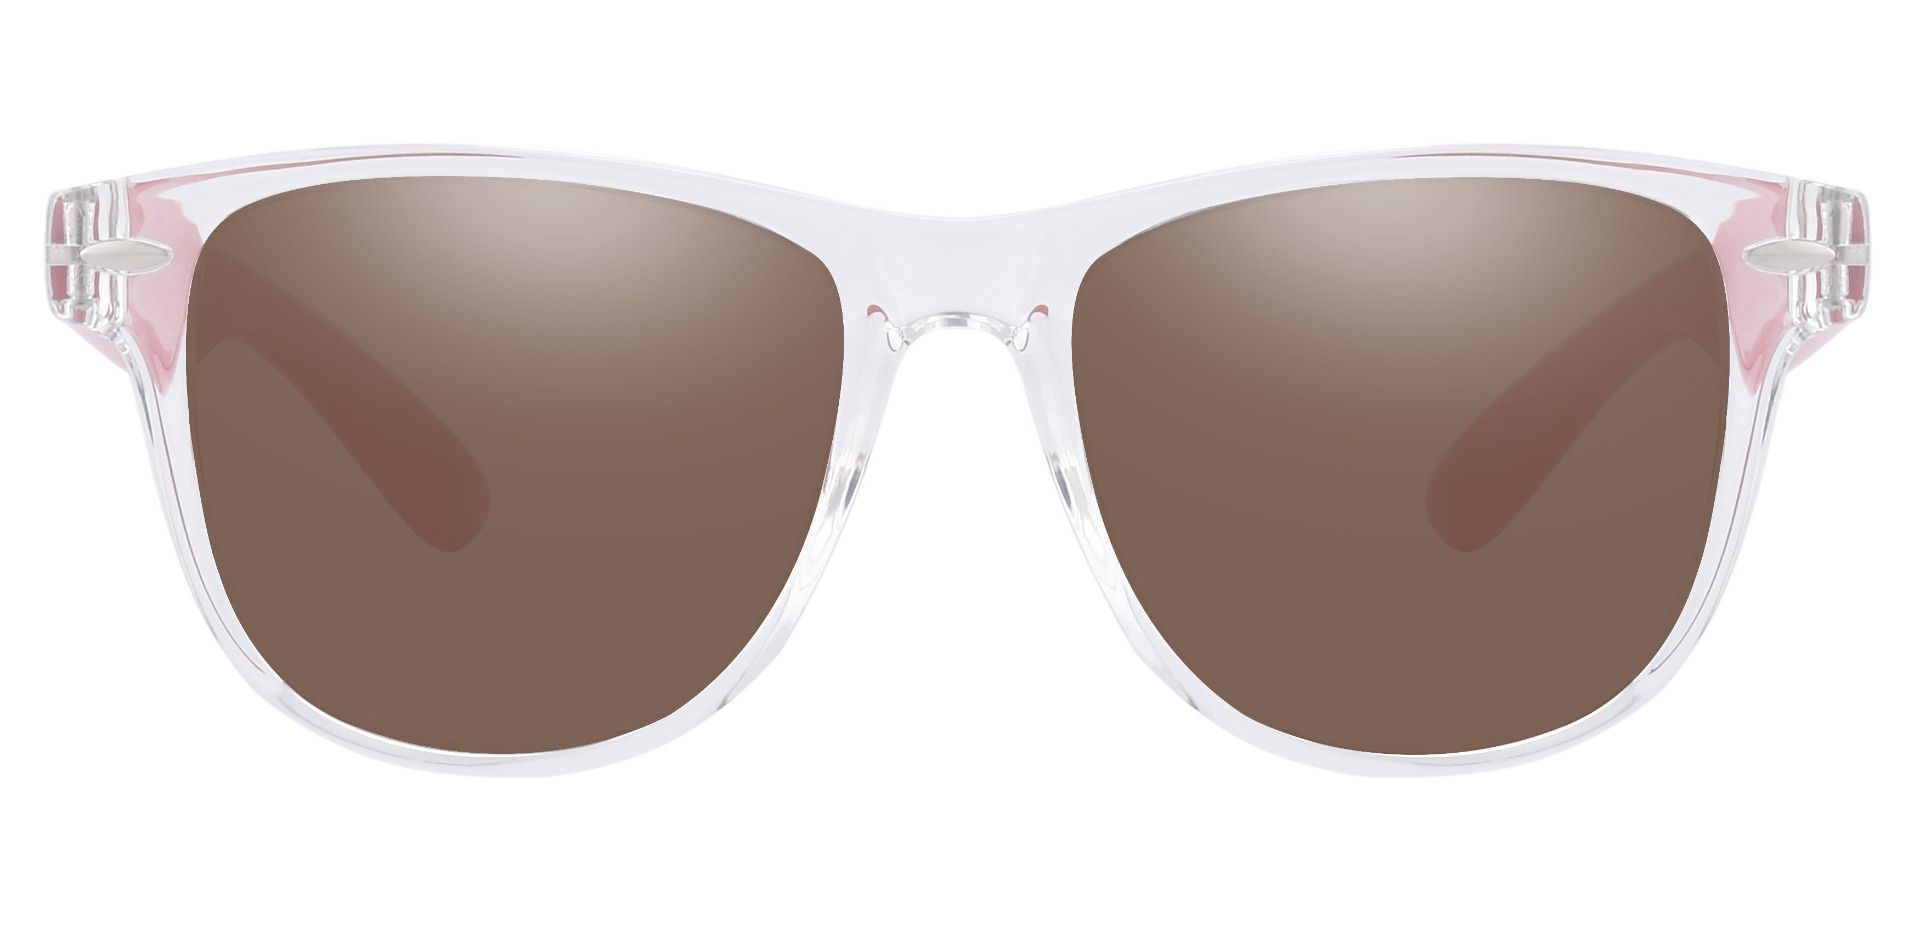 Radio Square Prescription Sunglasses - Clear Frame With Brown Lenses